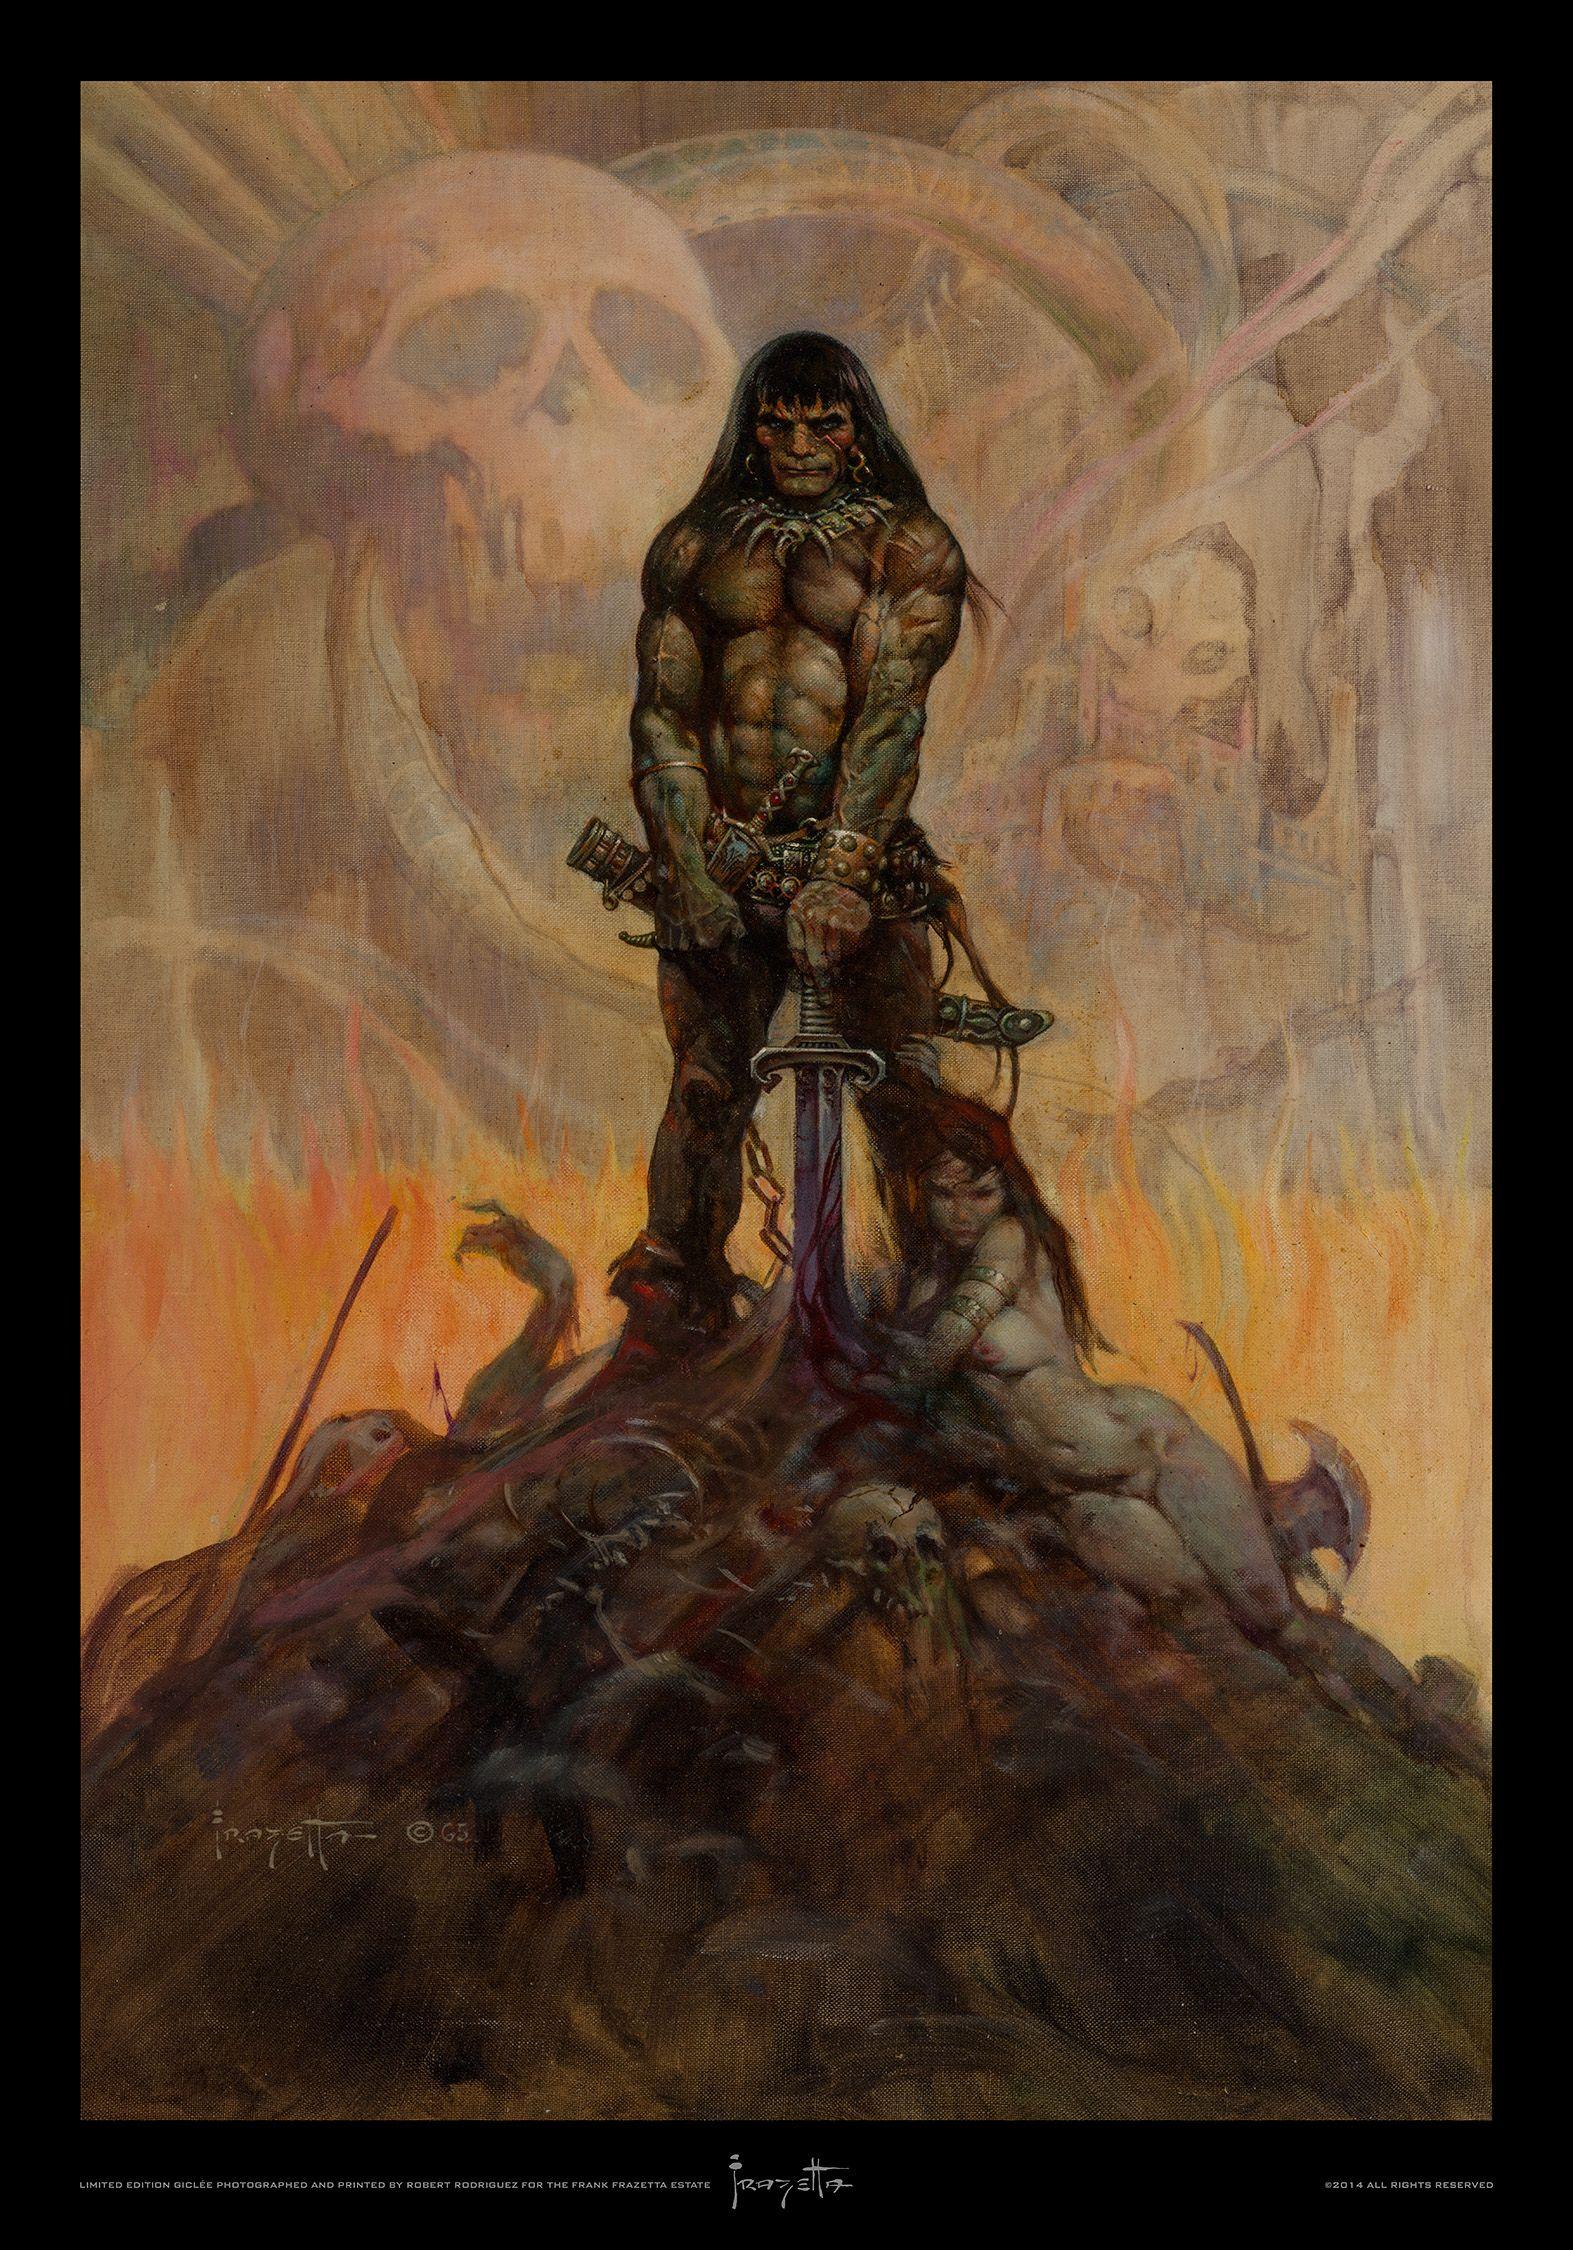 frank-frazetta-conan-the-barbarian-poster | Comic Book ...